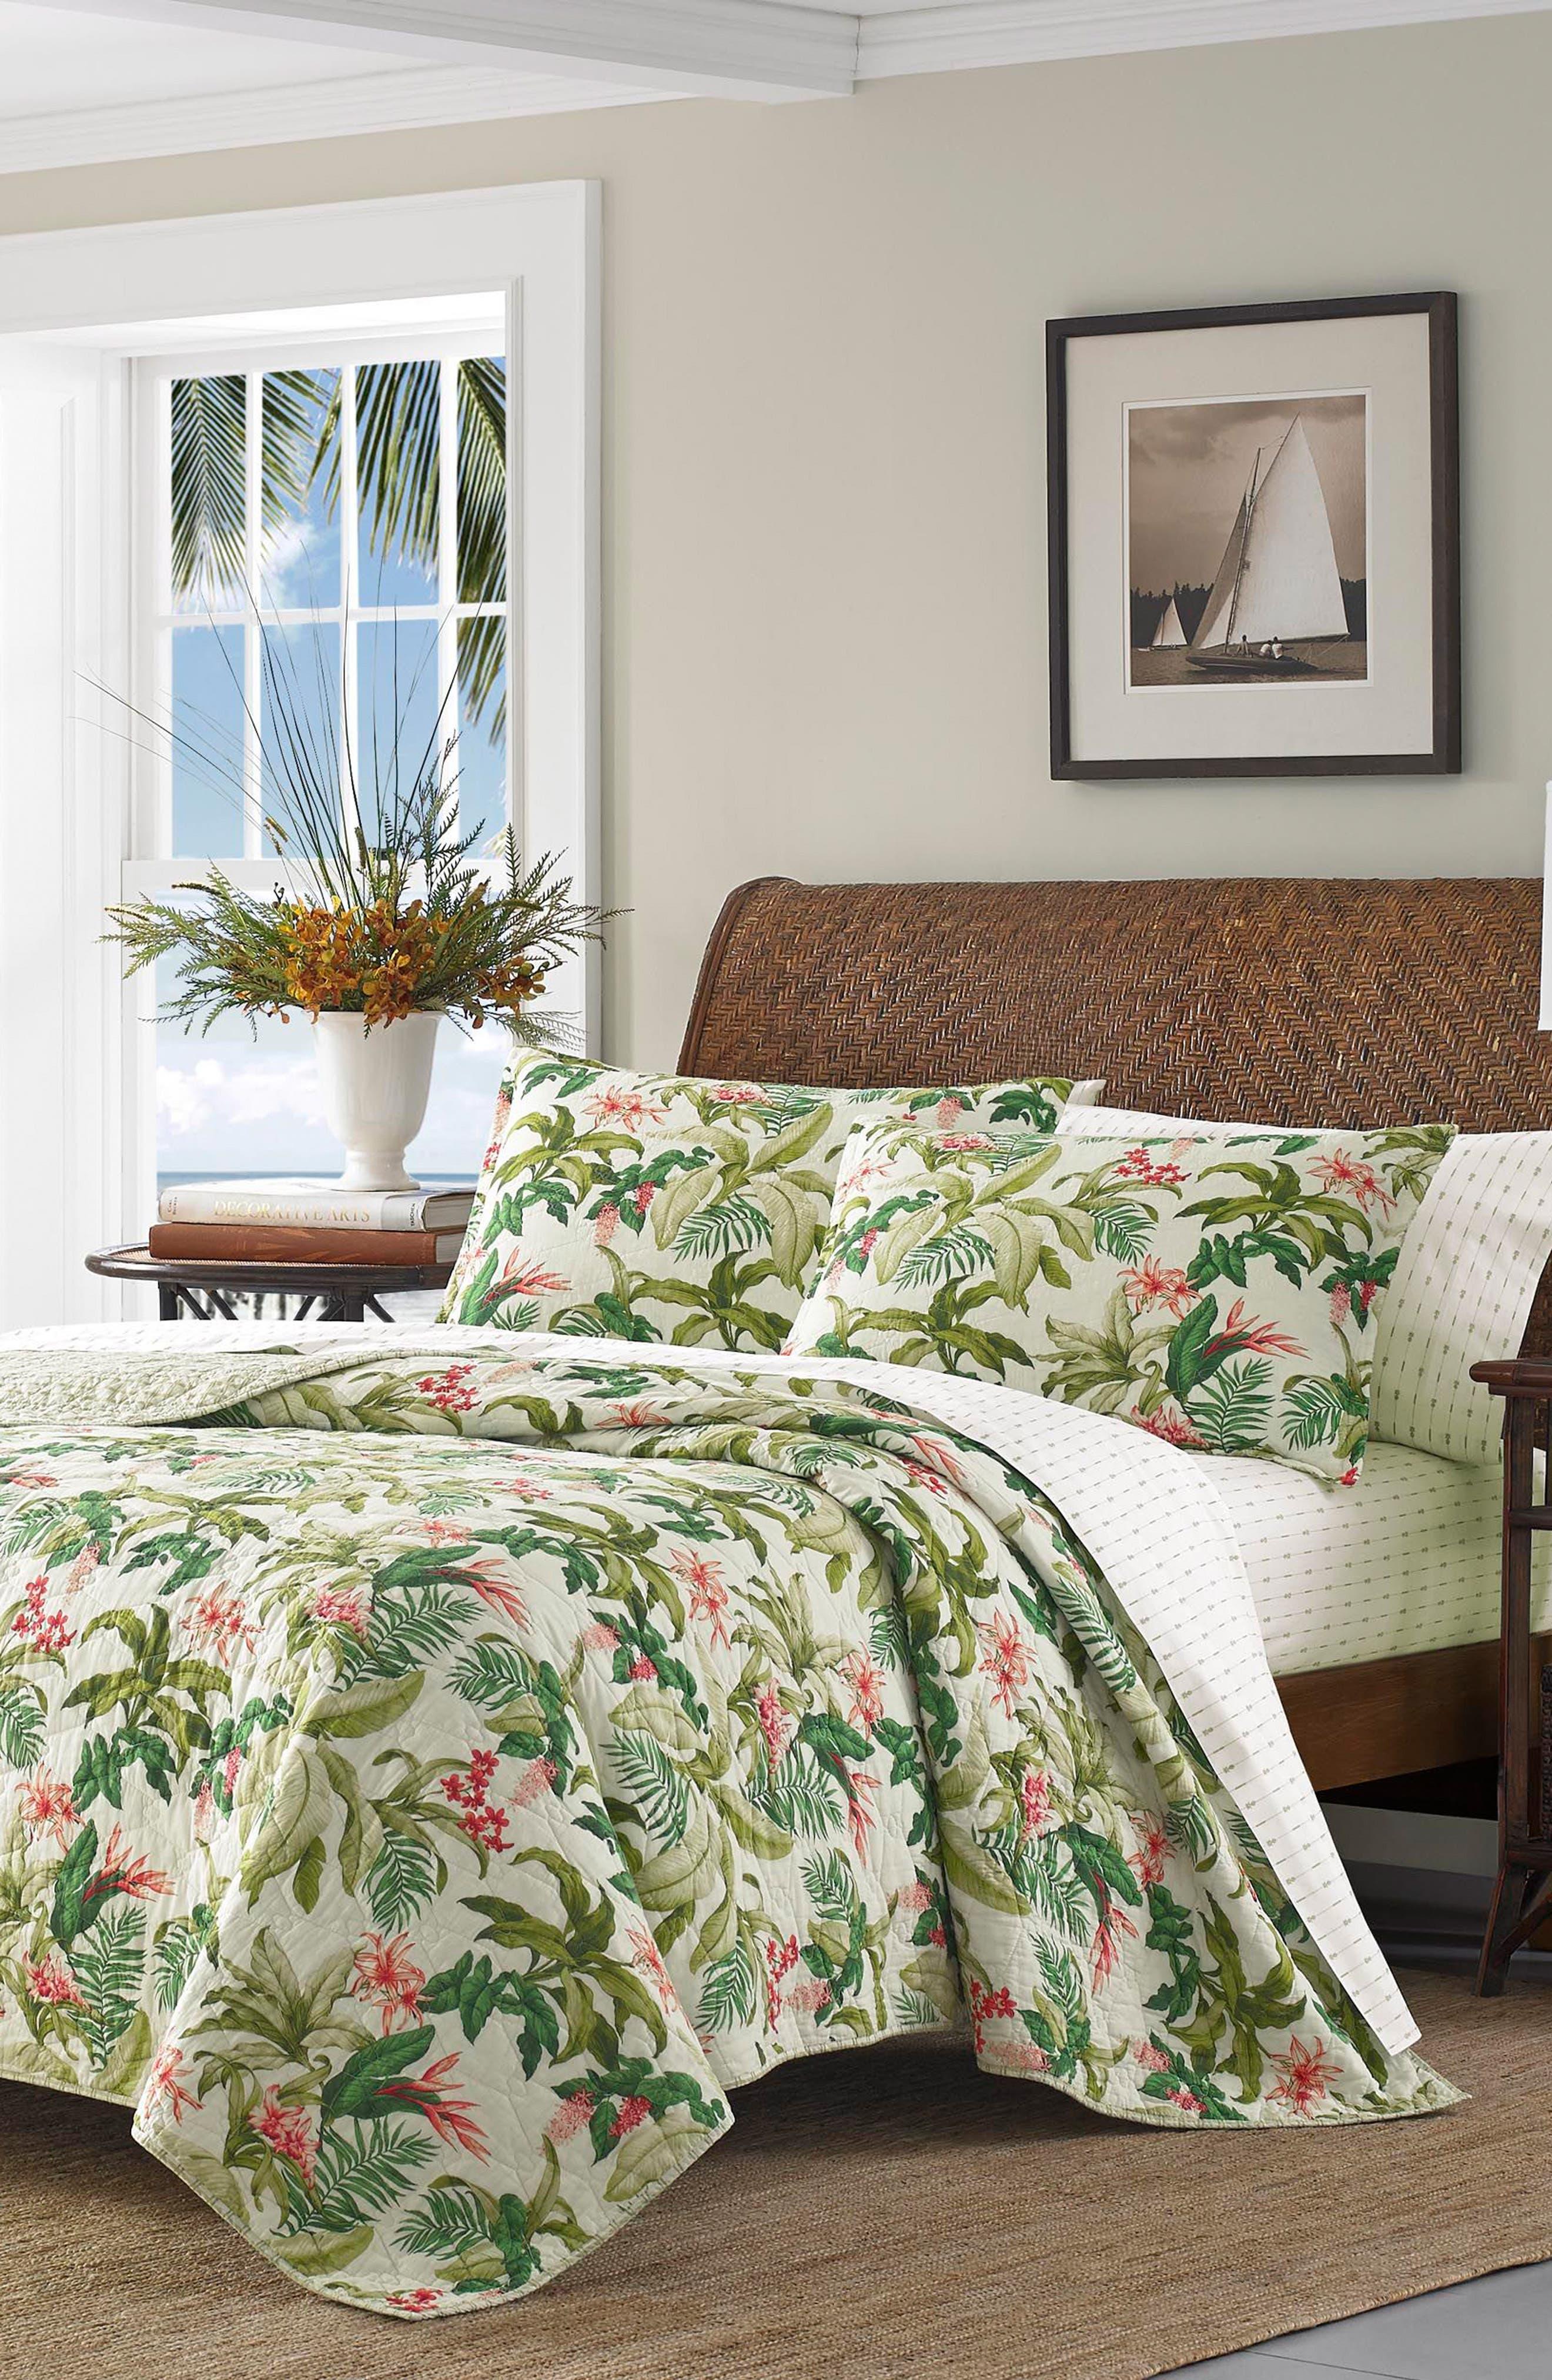 Alternate Image 1 Selected - Tommy Bahama Monte Verde Quilt